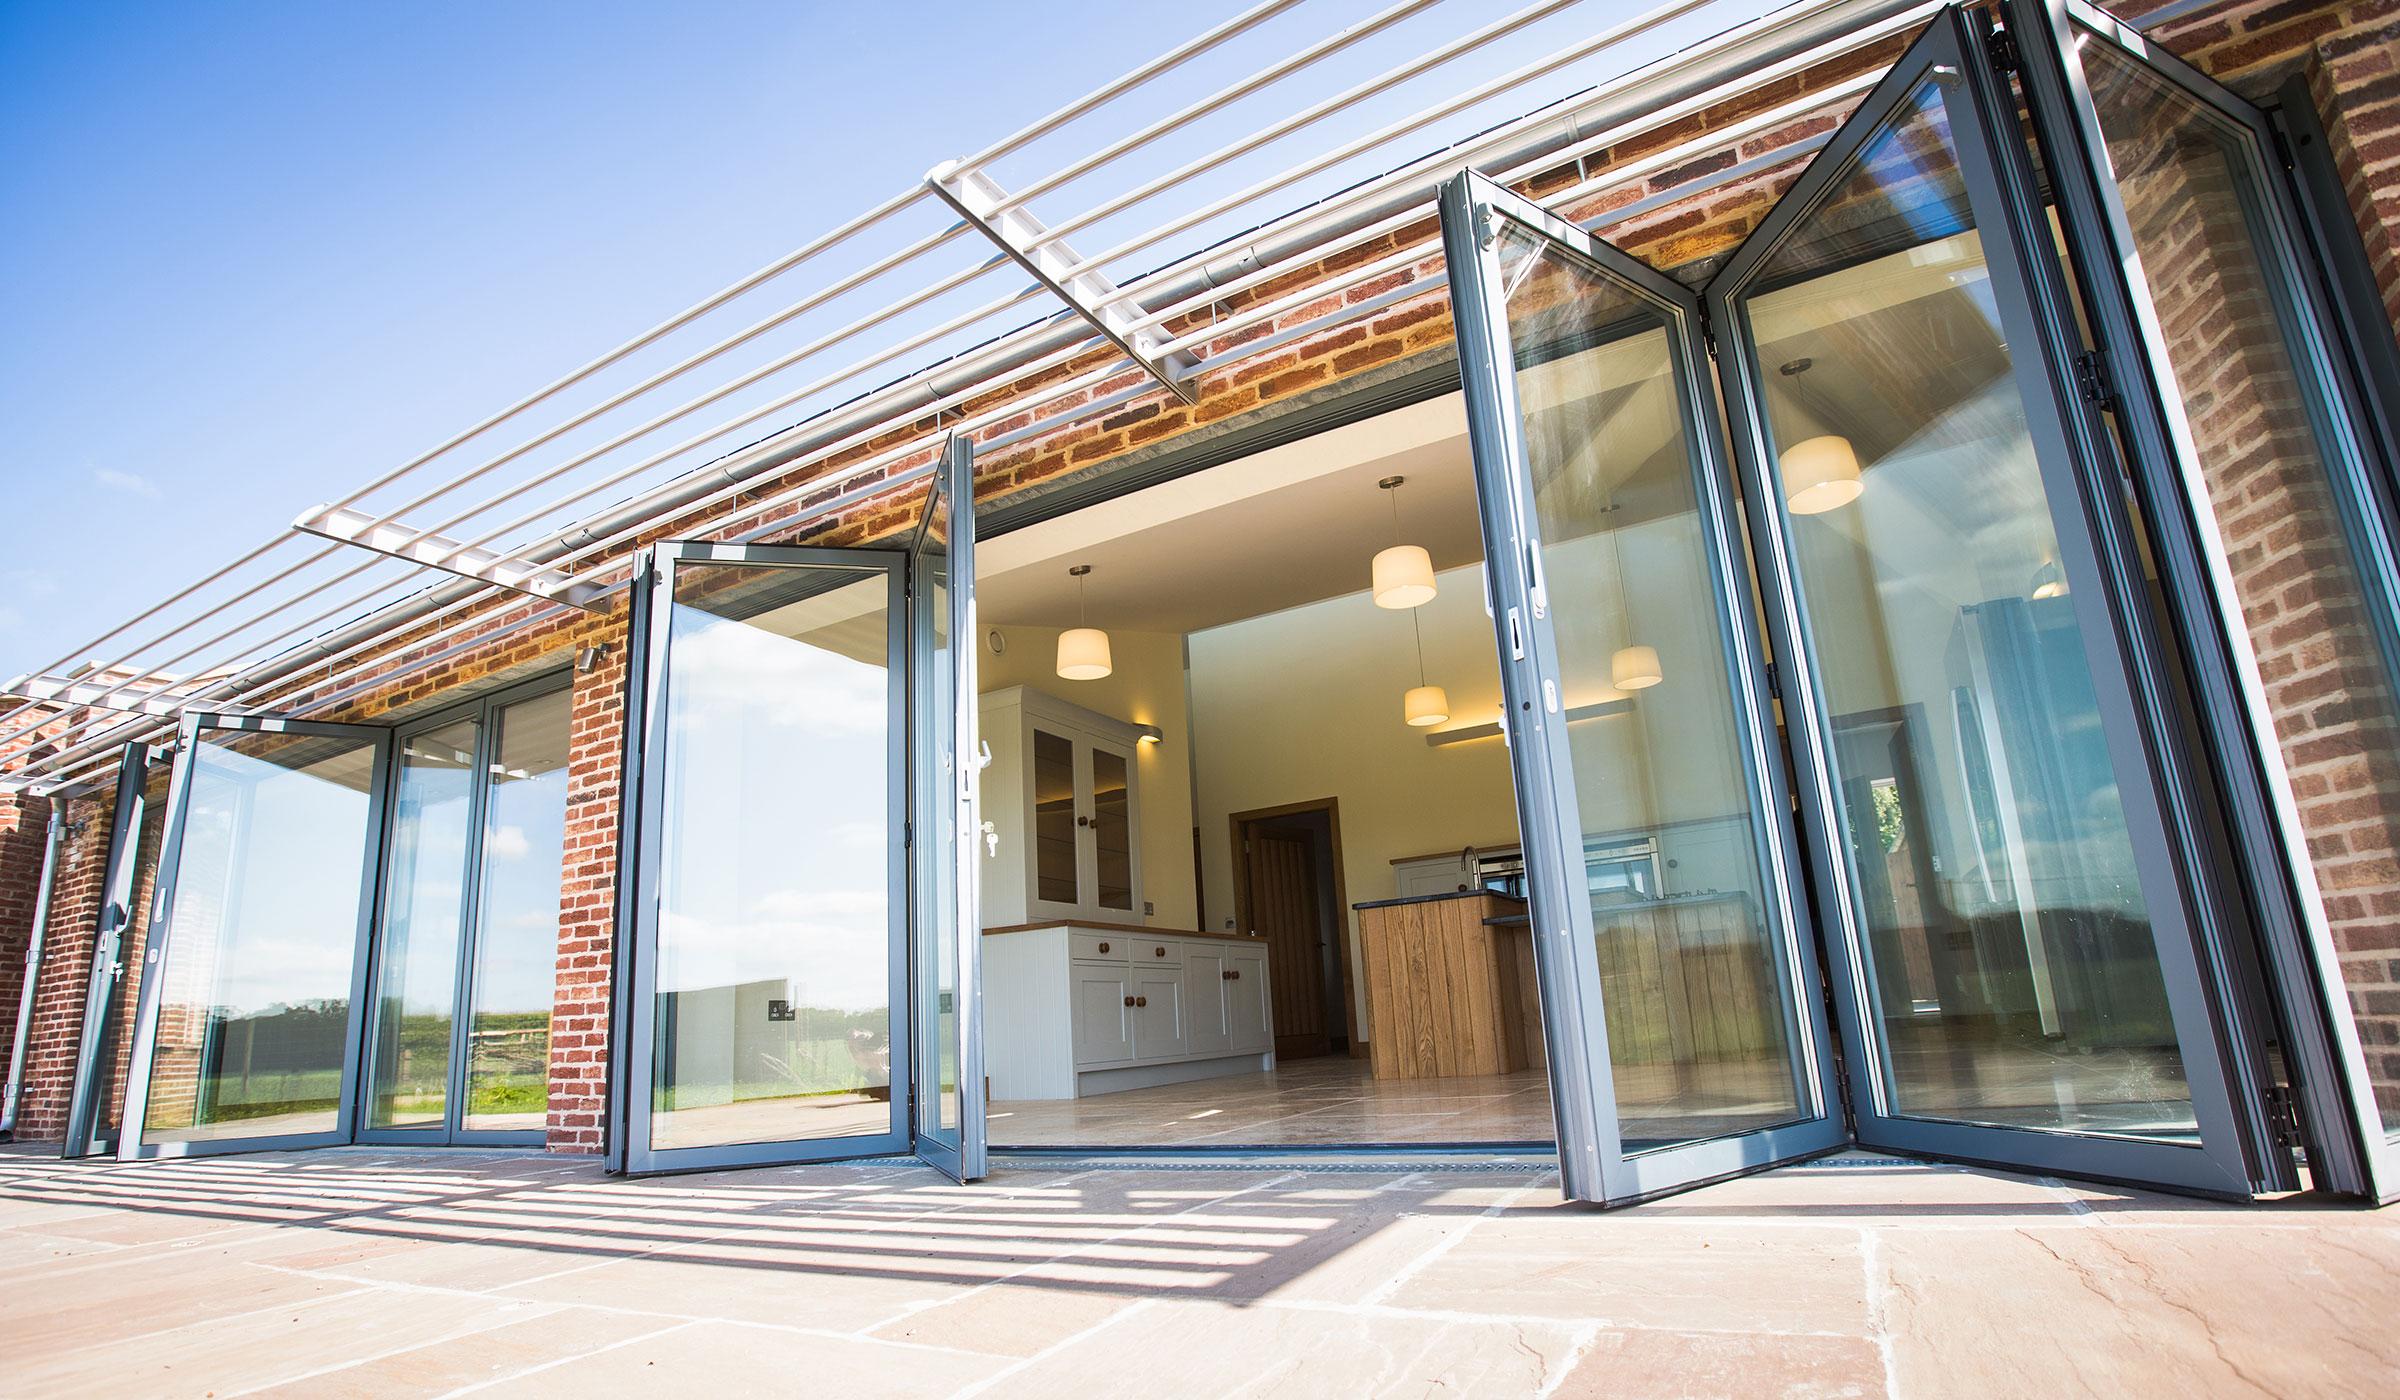 Birchwood Farmhouse - An innovative home embracing its landscape